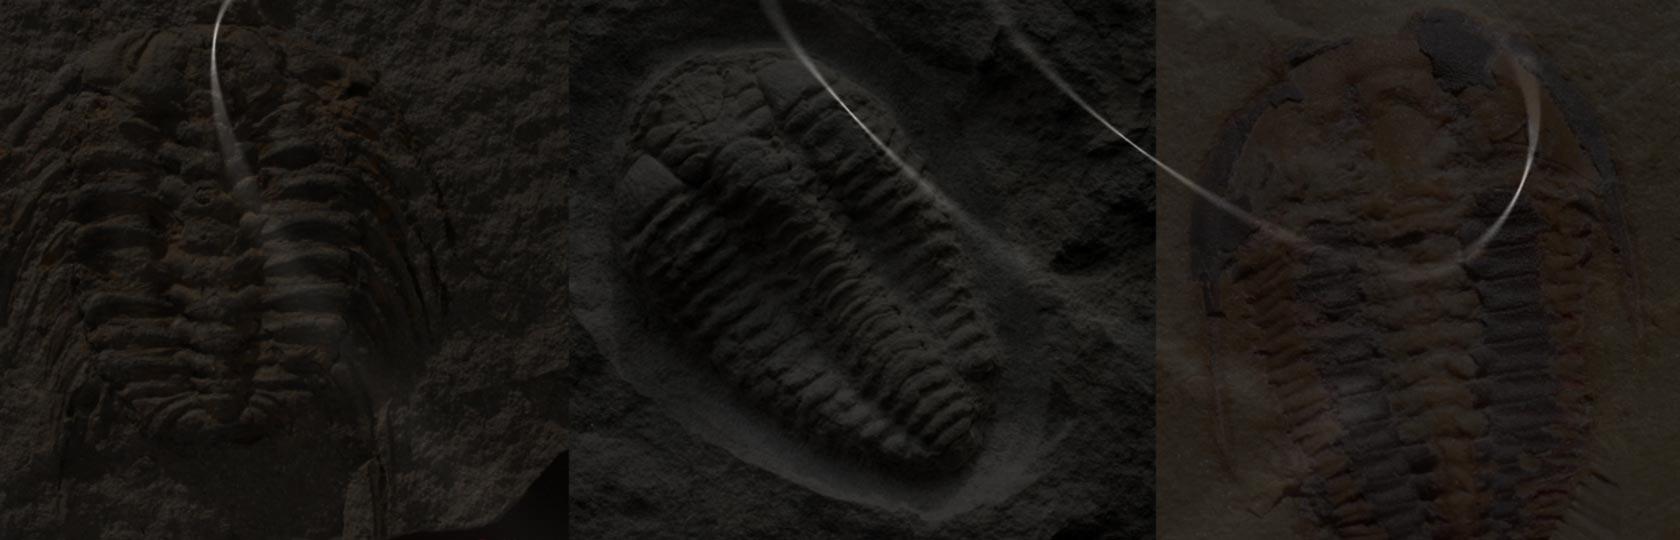 Ordovician Trilobites Morocco